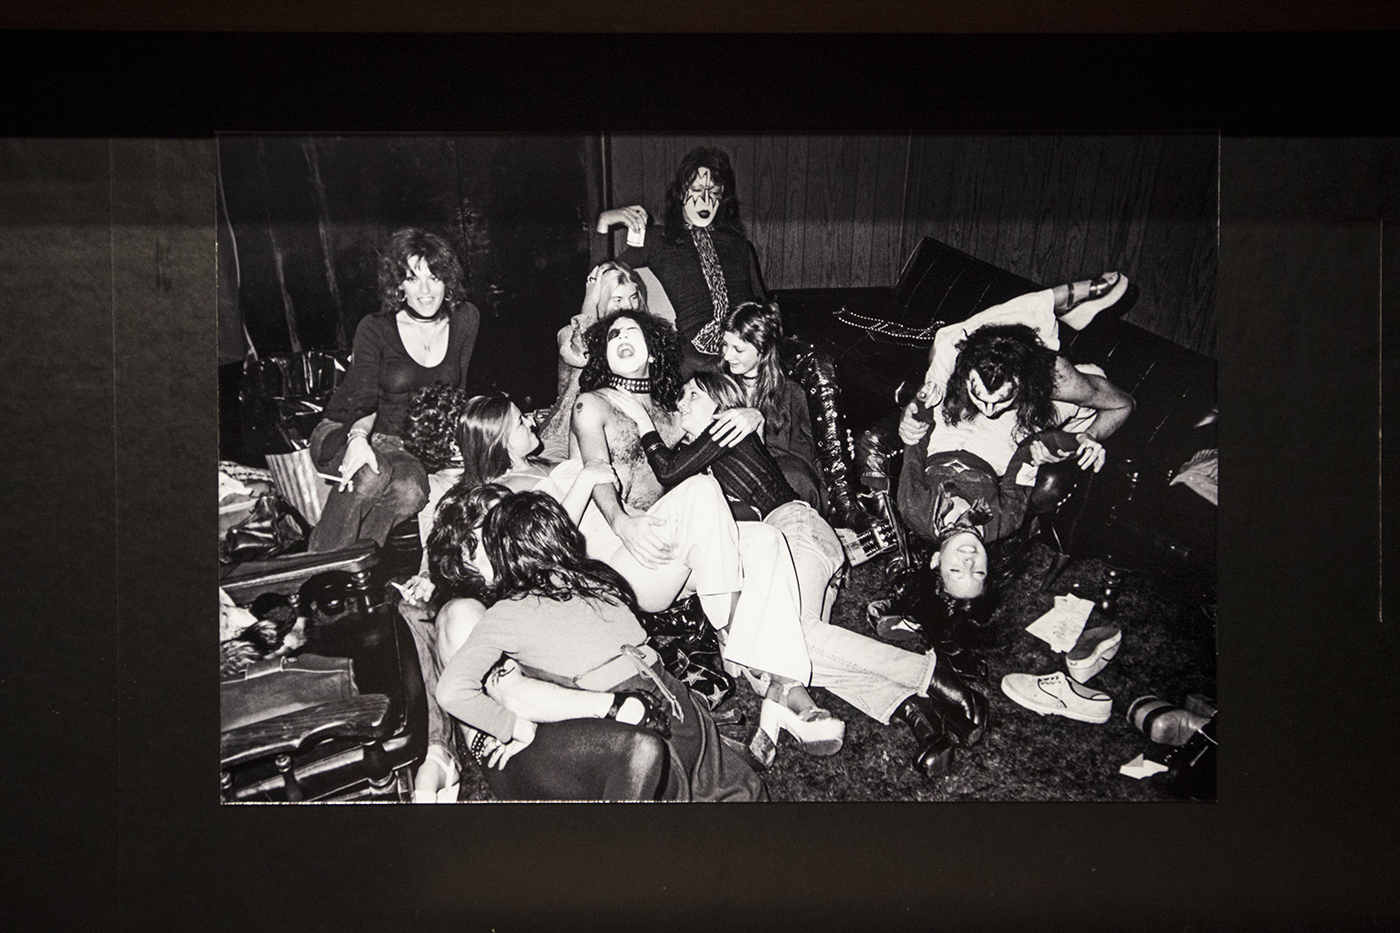 m-0060 【レポート】ロックの歴史が凝縮。フジロックファンも必見のボブ・グルーエン写真展